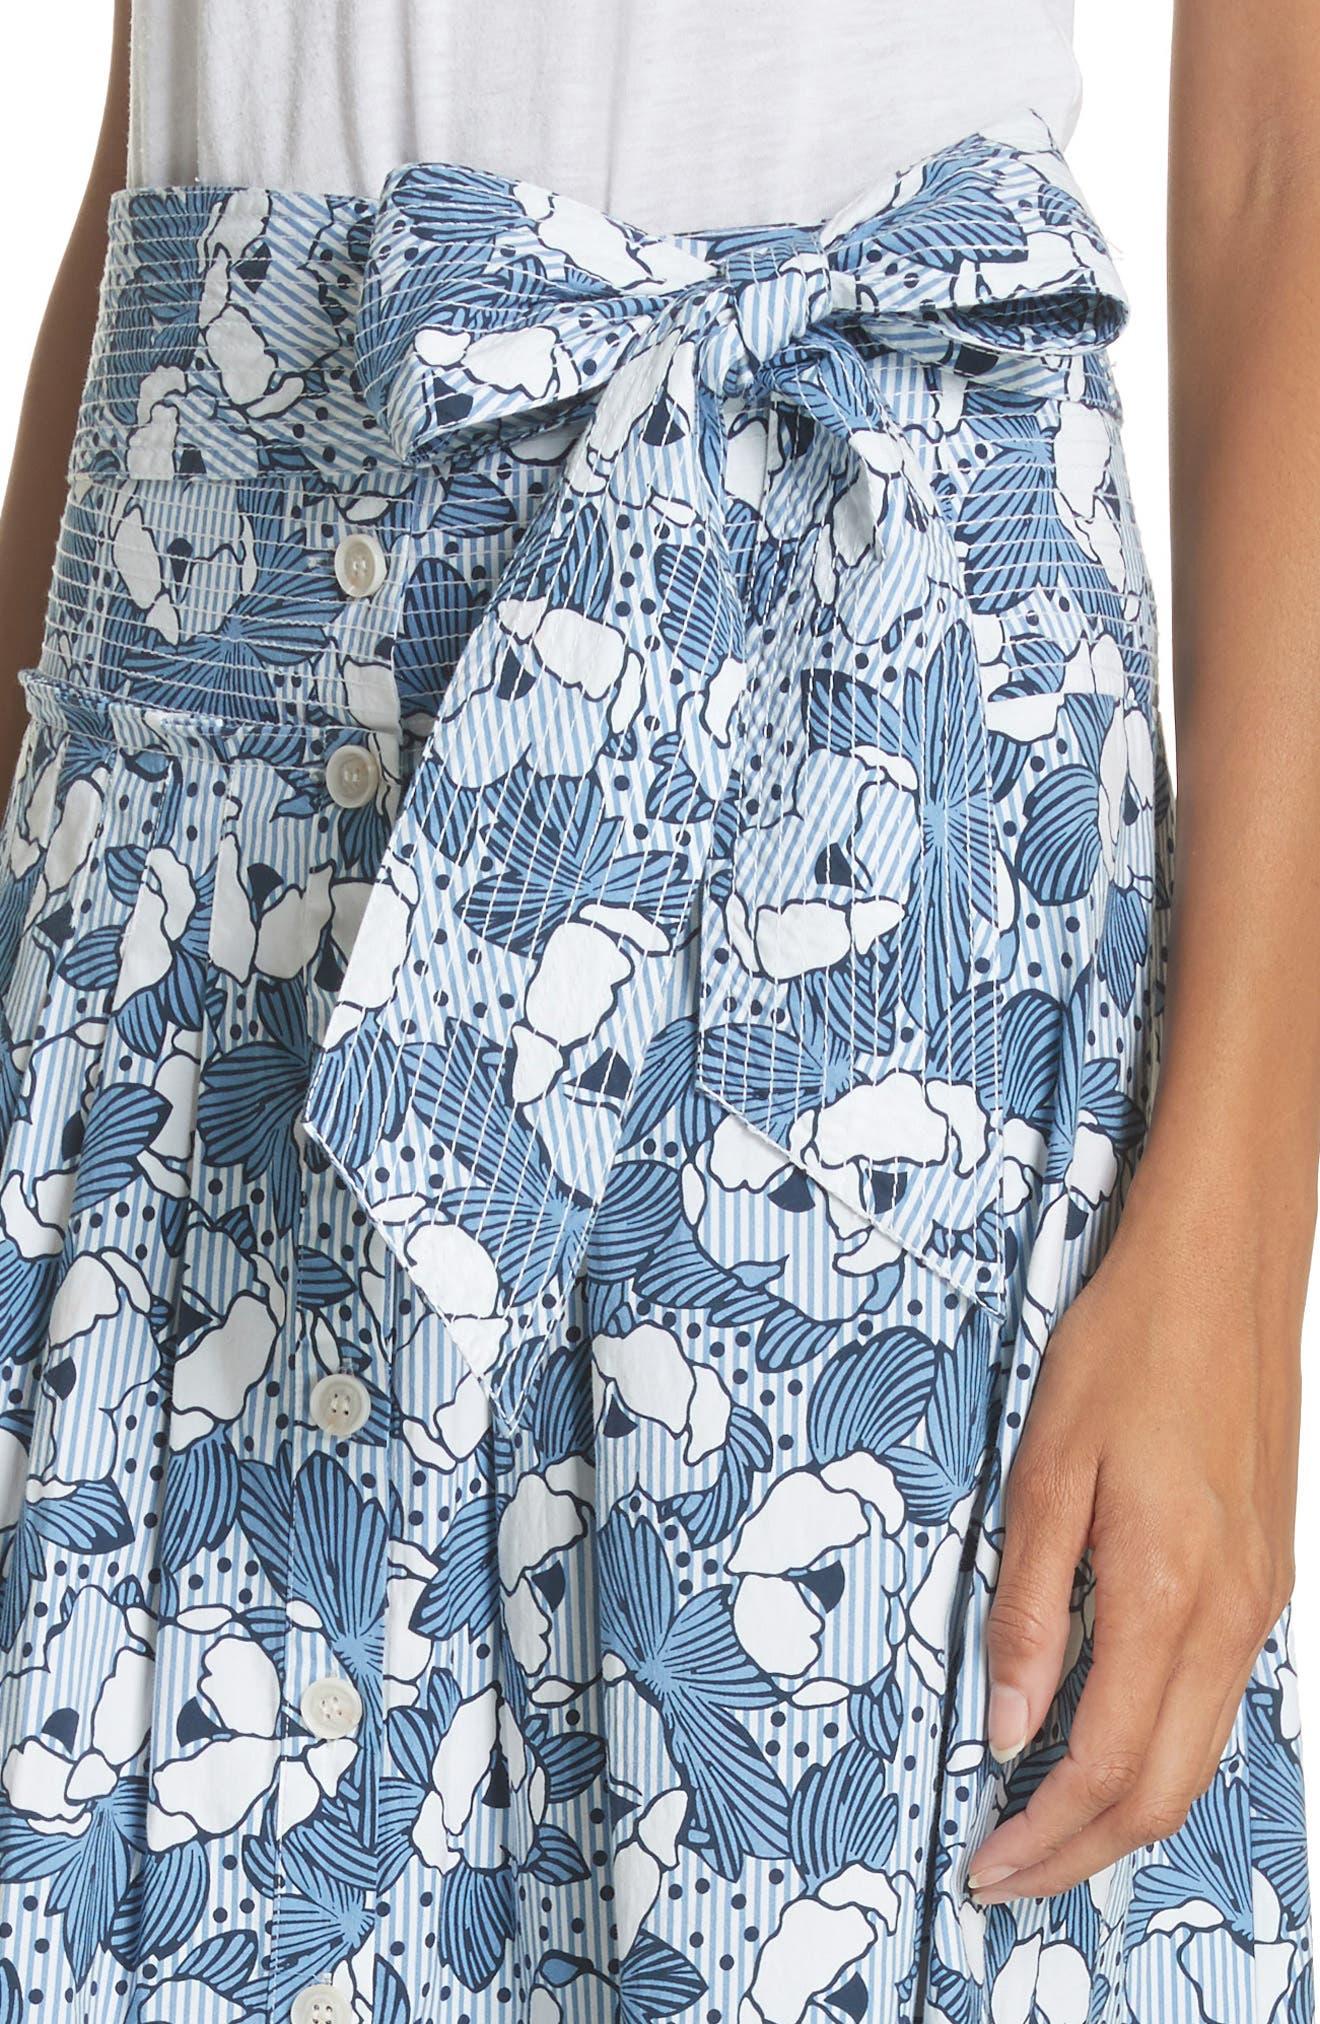 Caralina Floral Print Midi Skirt,                             Alternate thumbnail 4, color,                             463